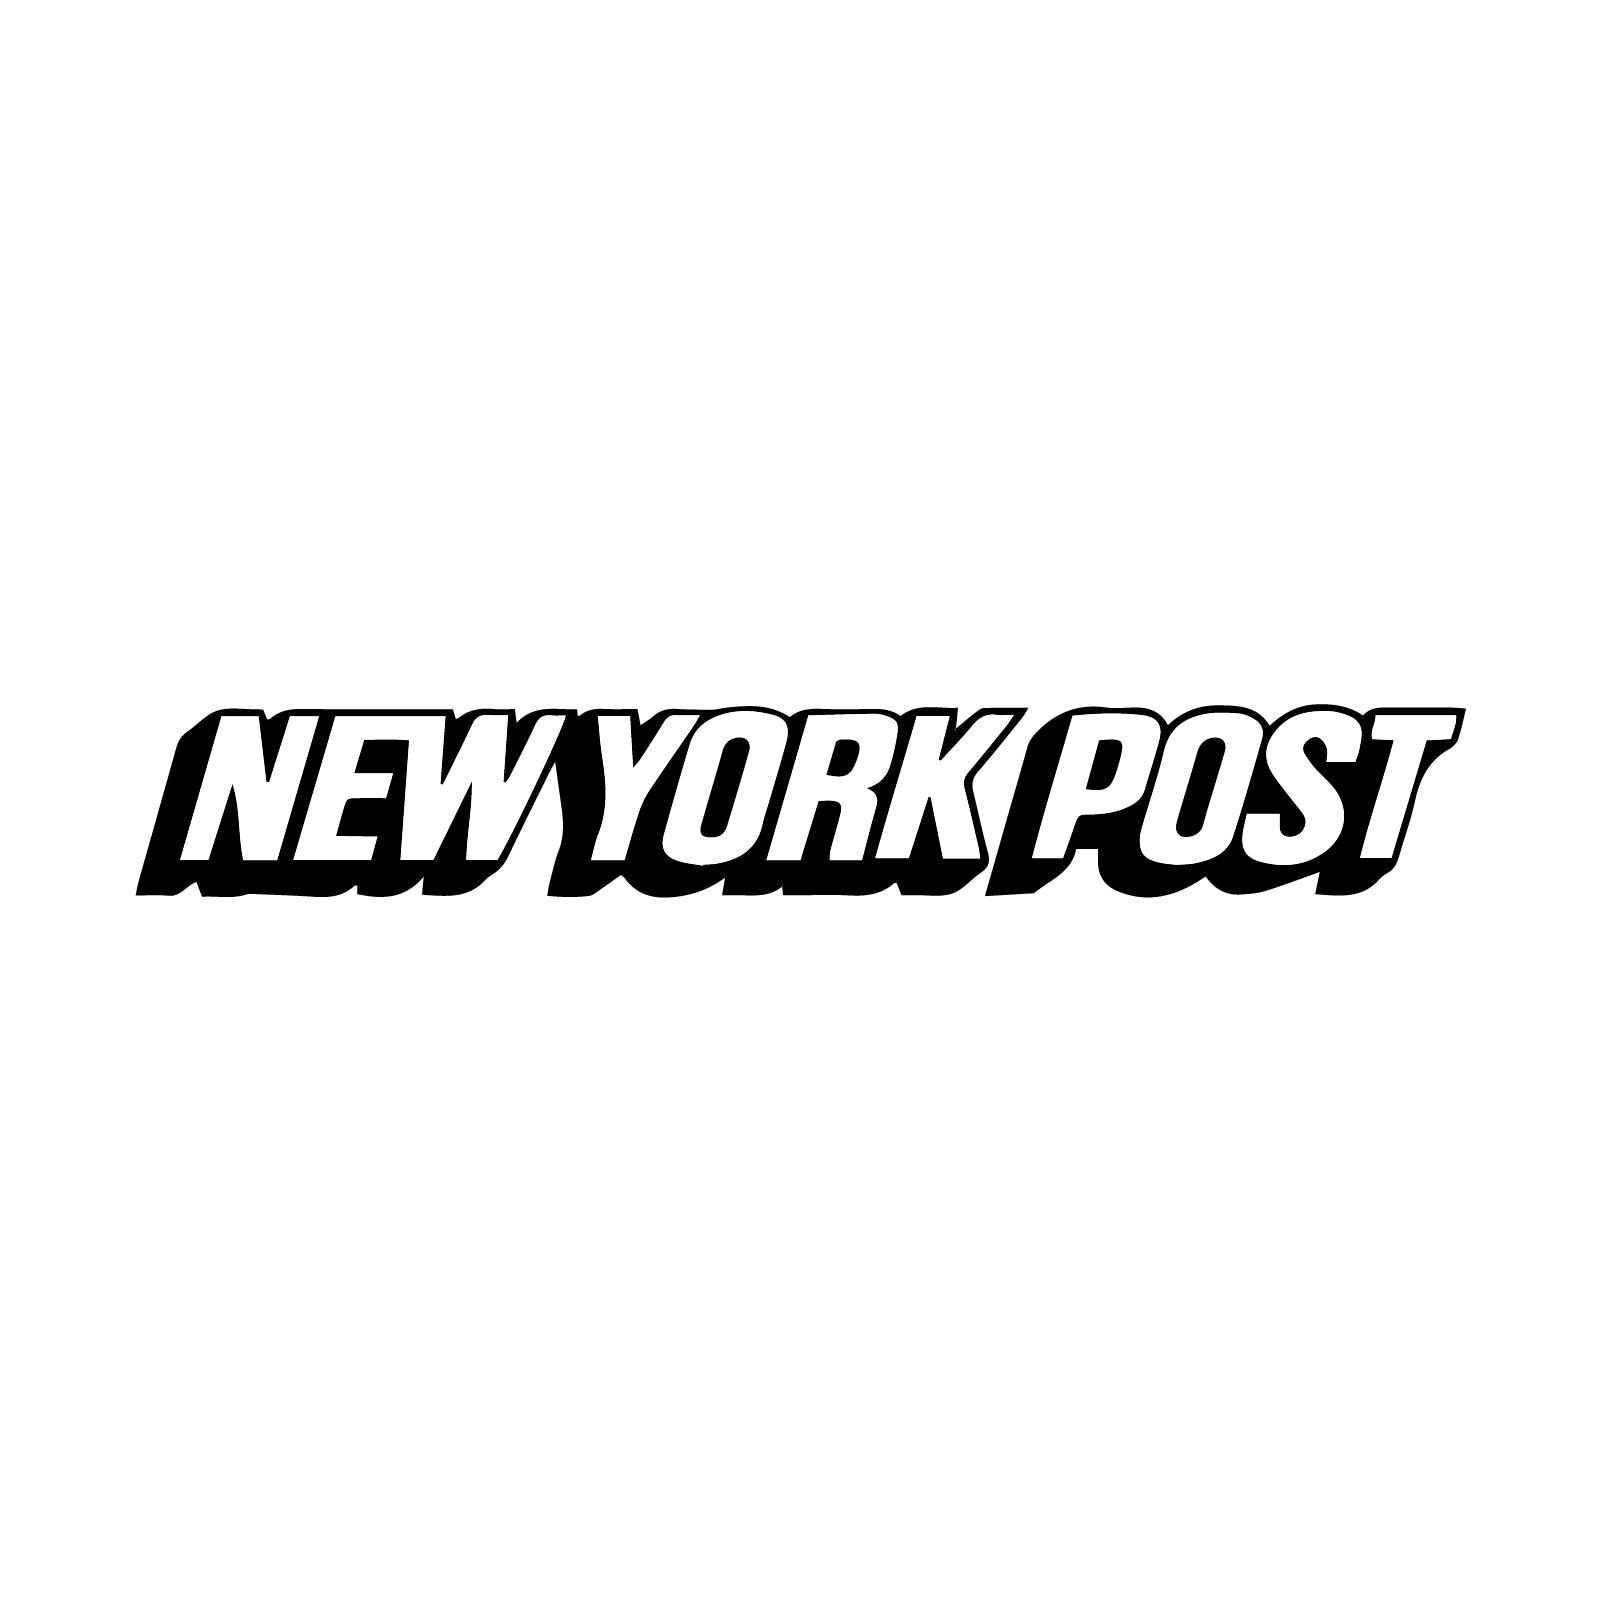 Press Logos_New York Post.png